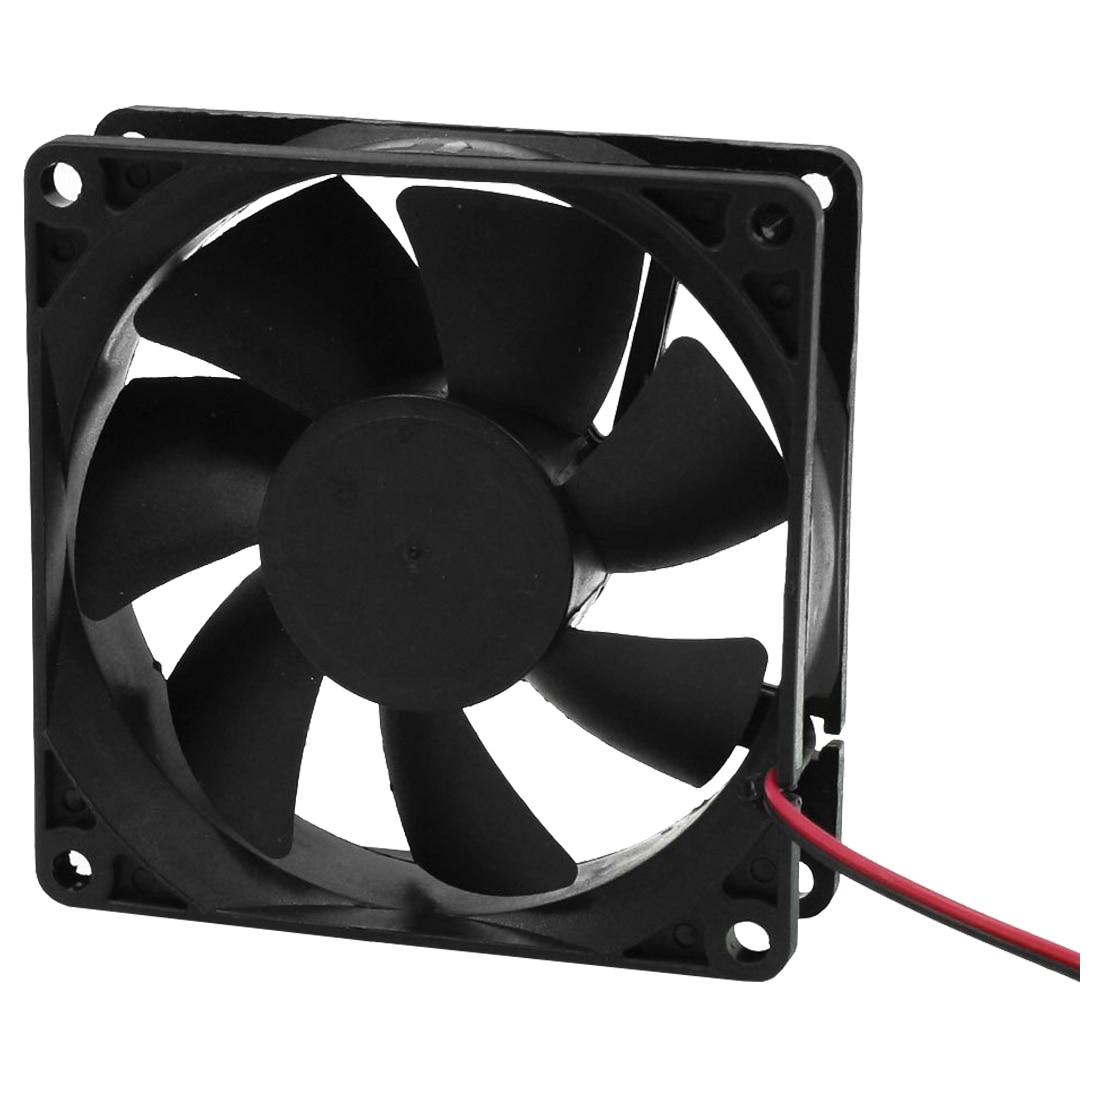 Кулер вентилятор 80 мм DC 12 В в Вт 2 Вт 4 штекер к Женский адаптер PC компьютер вентилятор